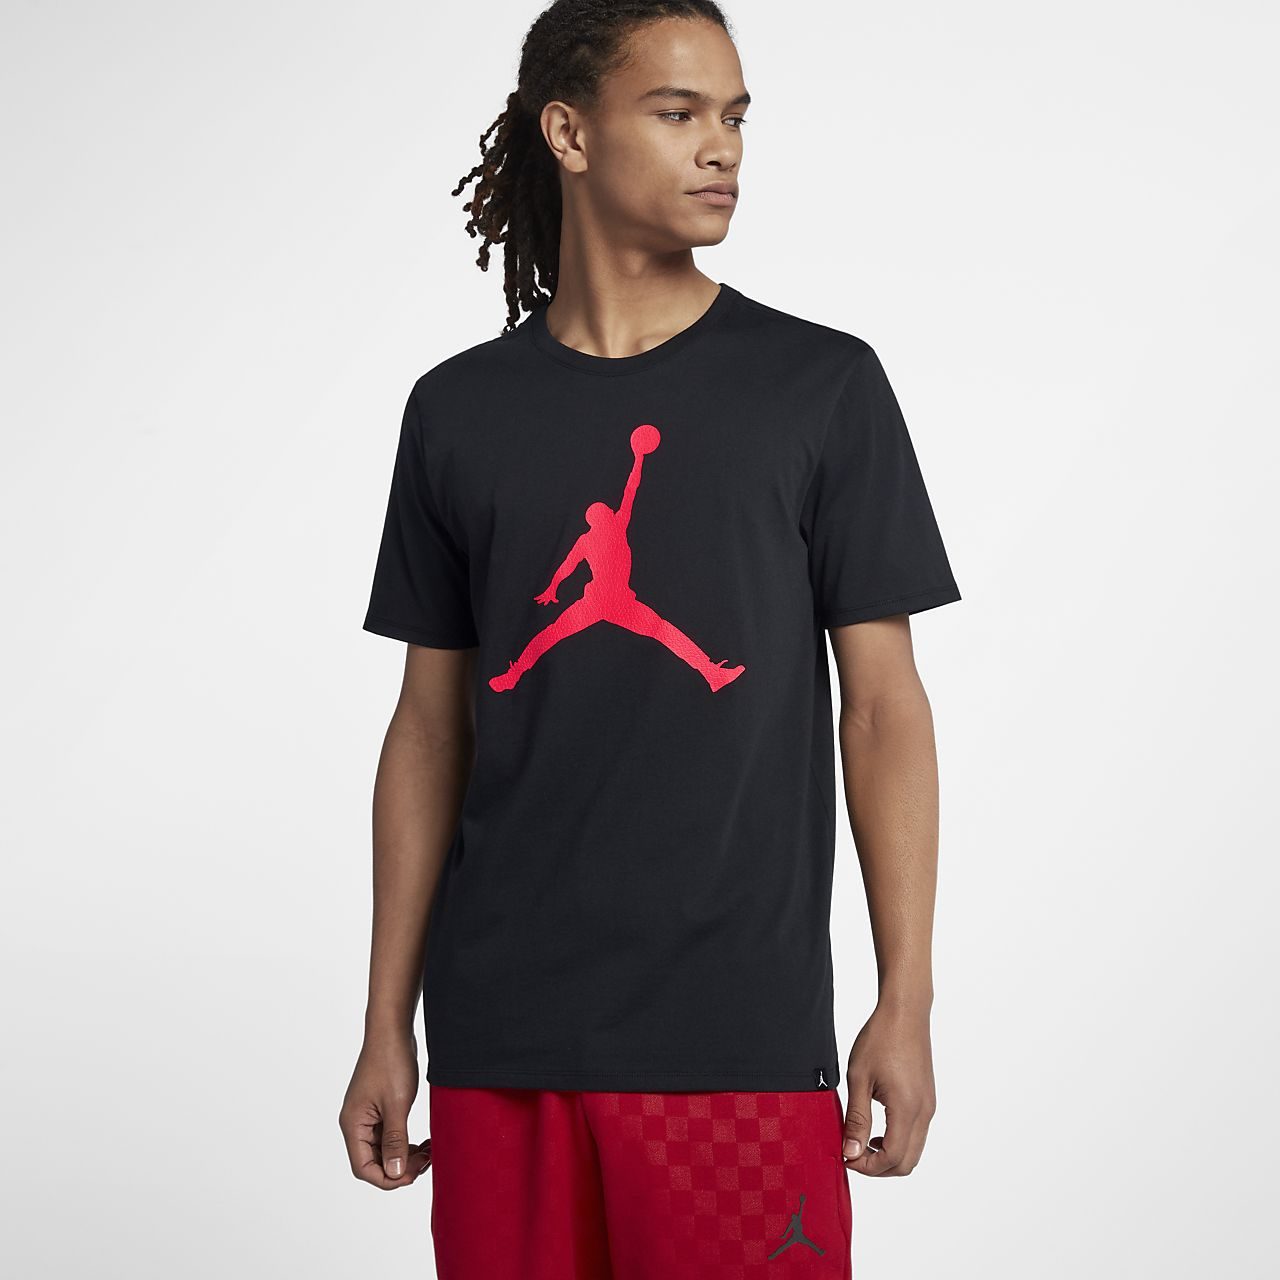 ... Jordan Sportswear Iconic Jumpman Men's T-Shirt